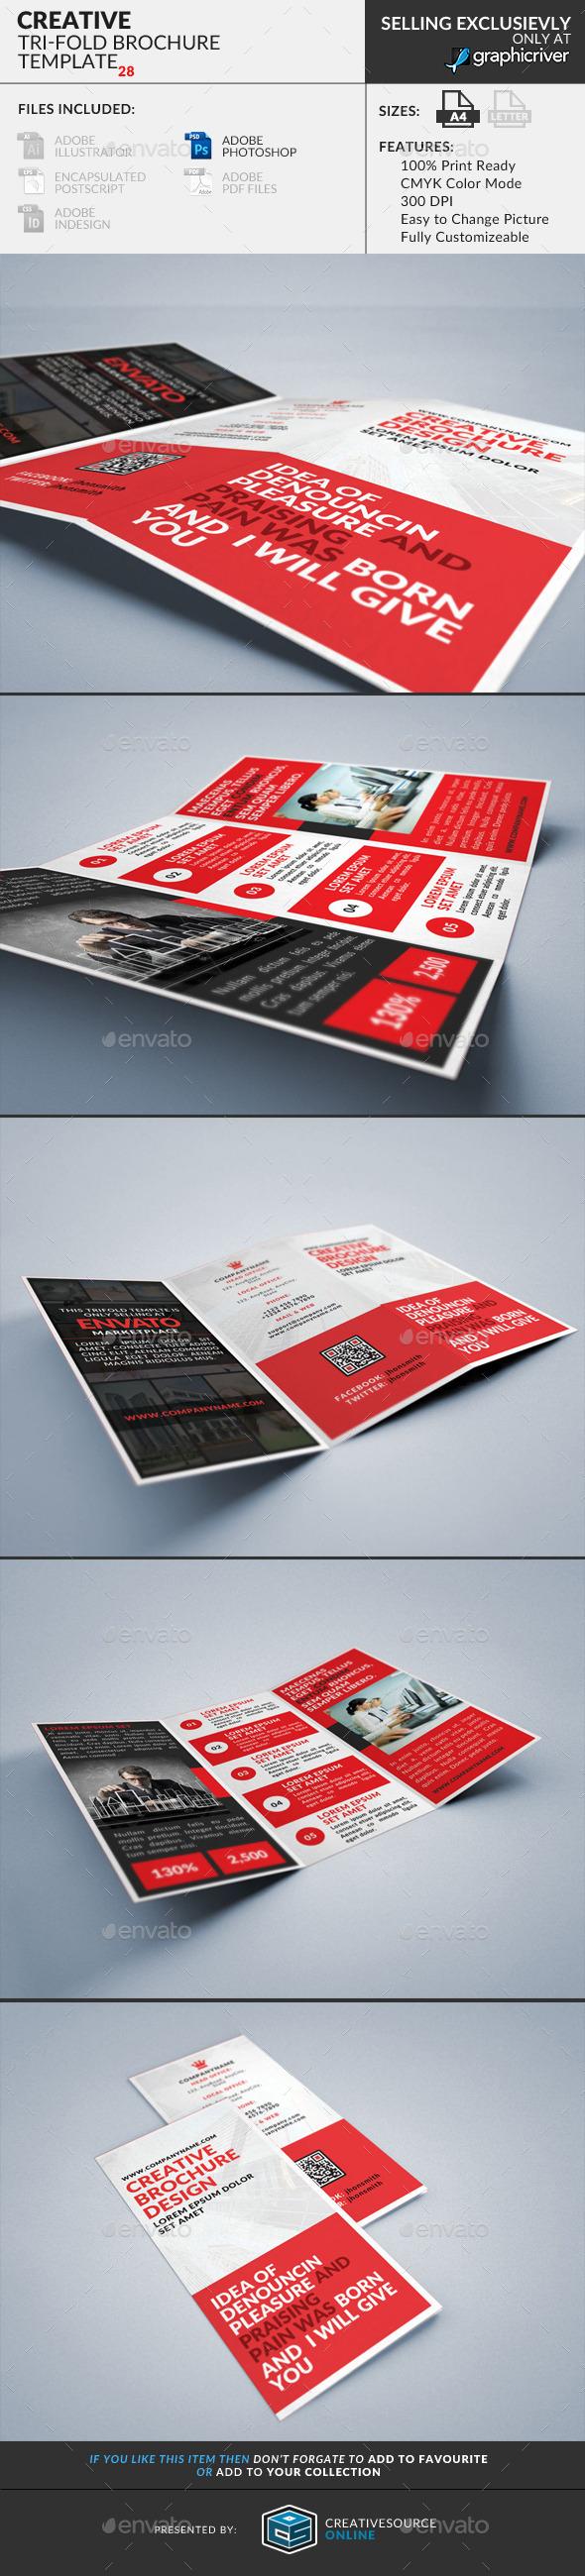 Trifold Brochure 28 : Creative - Corporate Brochures